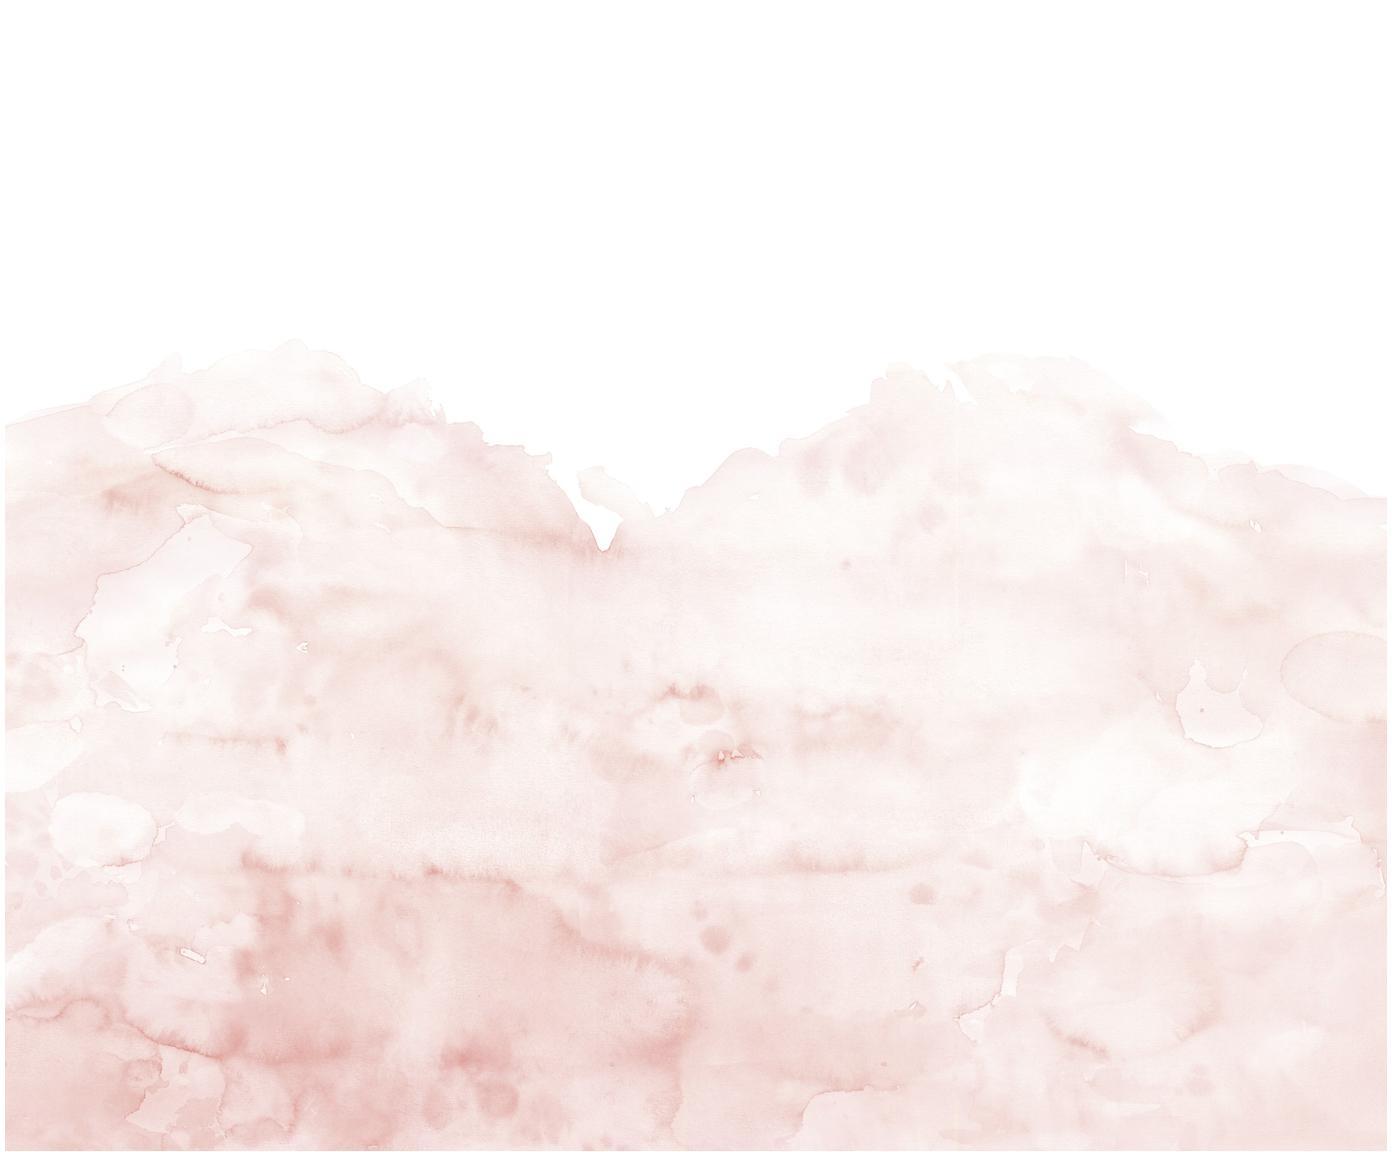 Fototapete Pink Clouds, Vlies, Rosa, Weiß, 372 x 280 cm